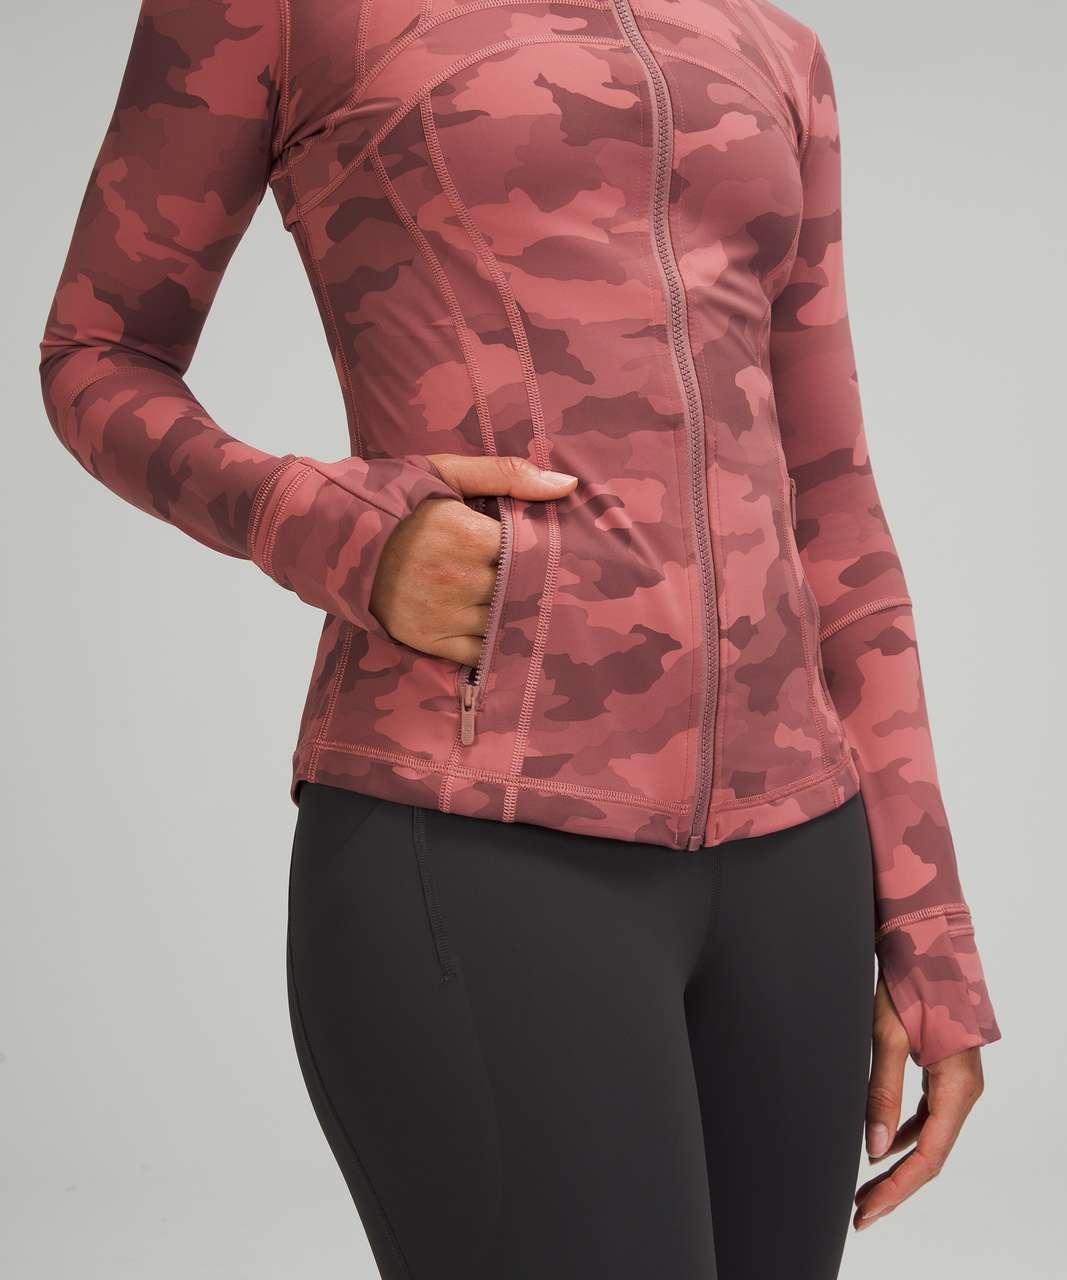 Lululemon Define Jacket - Heritage 365 Camo Brier Rose Multi